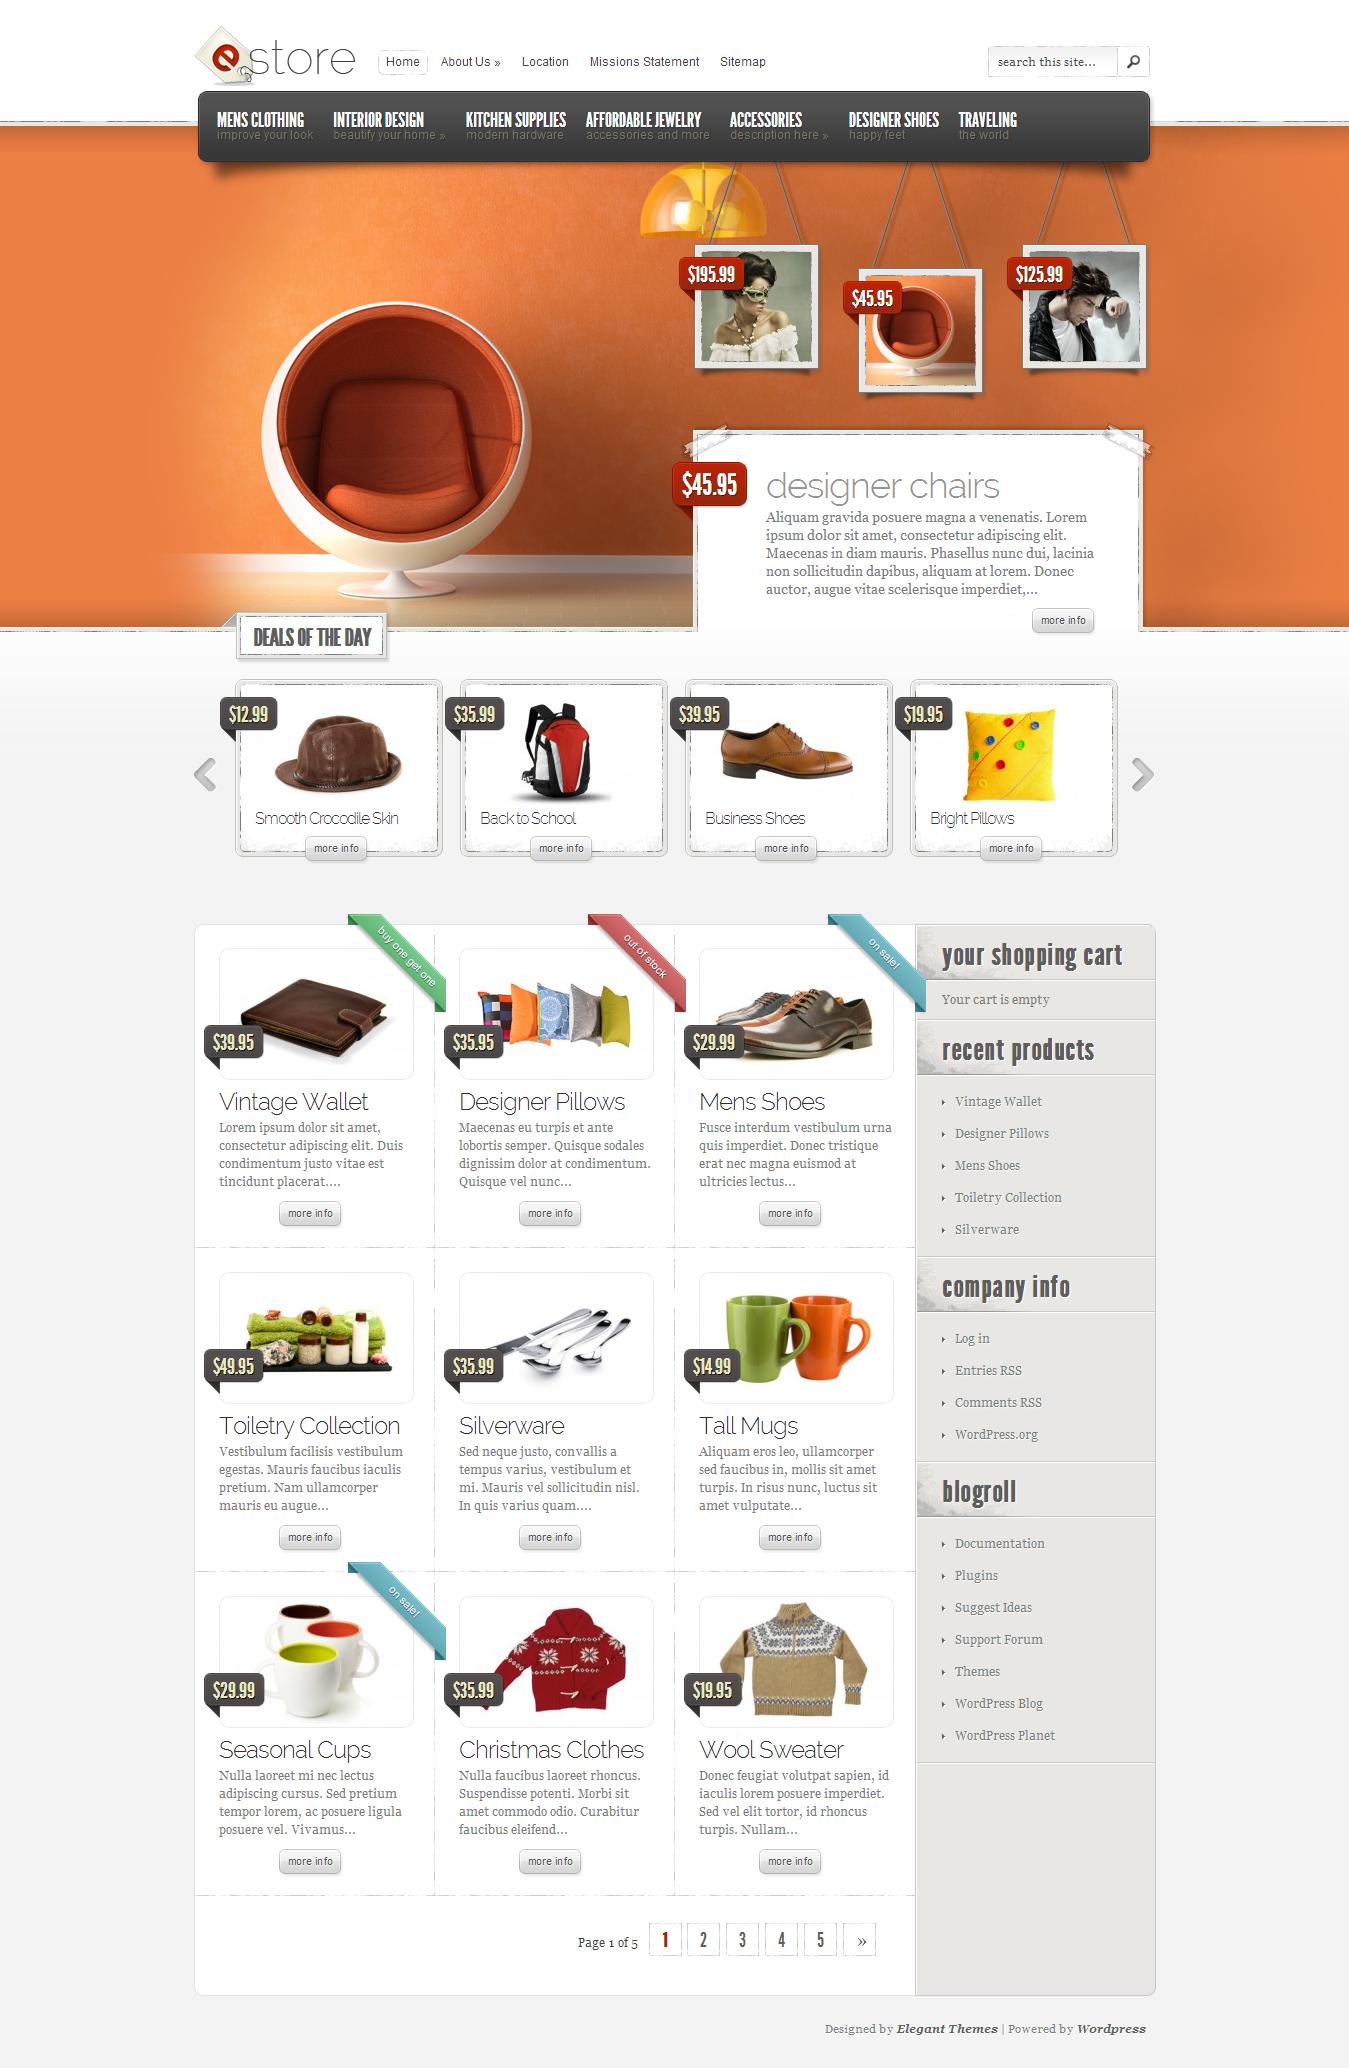 eStore eCommerce WordPress Theme http://www.elegantthemes.com ...